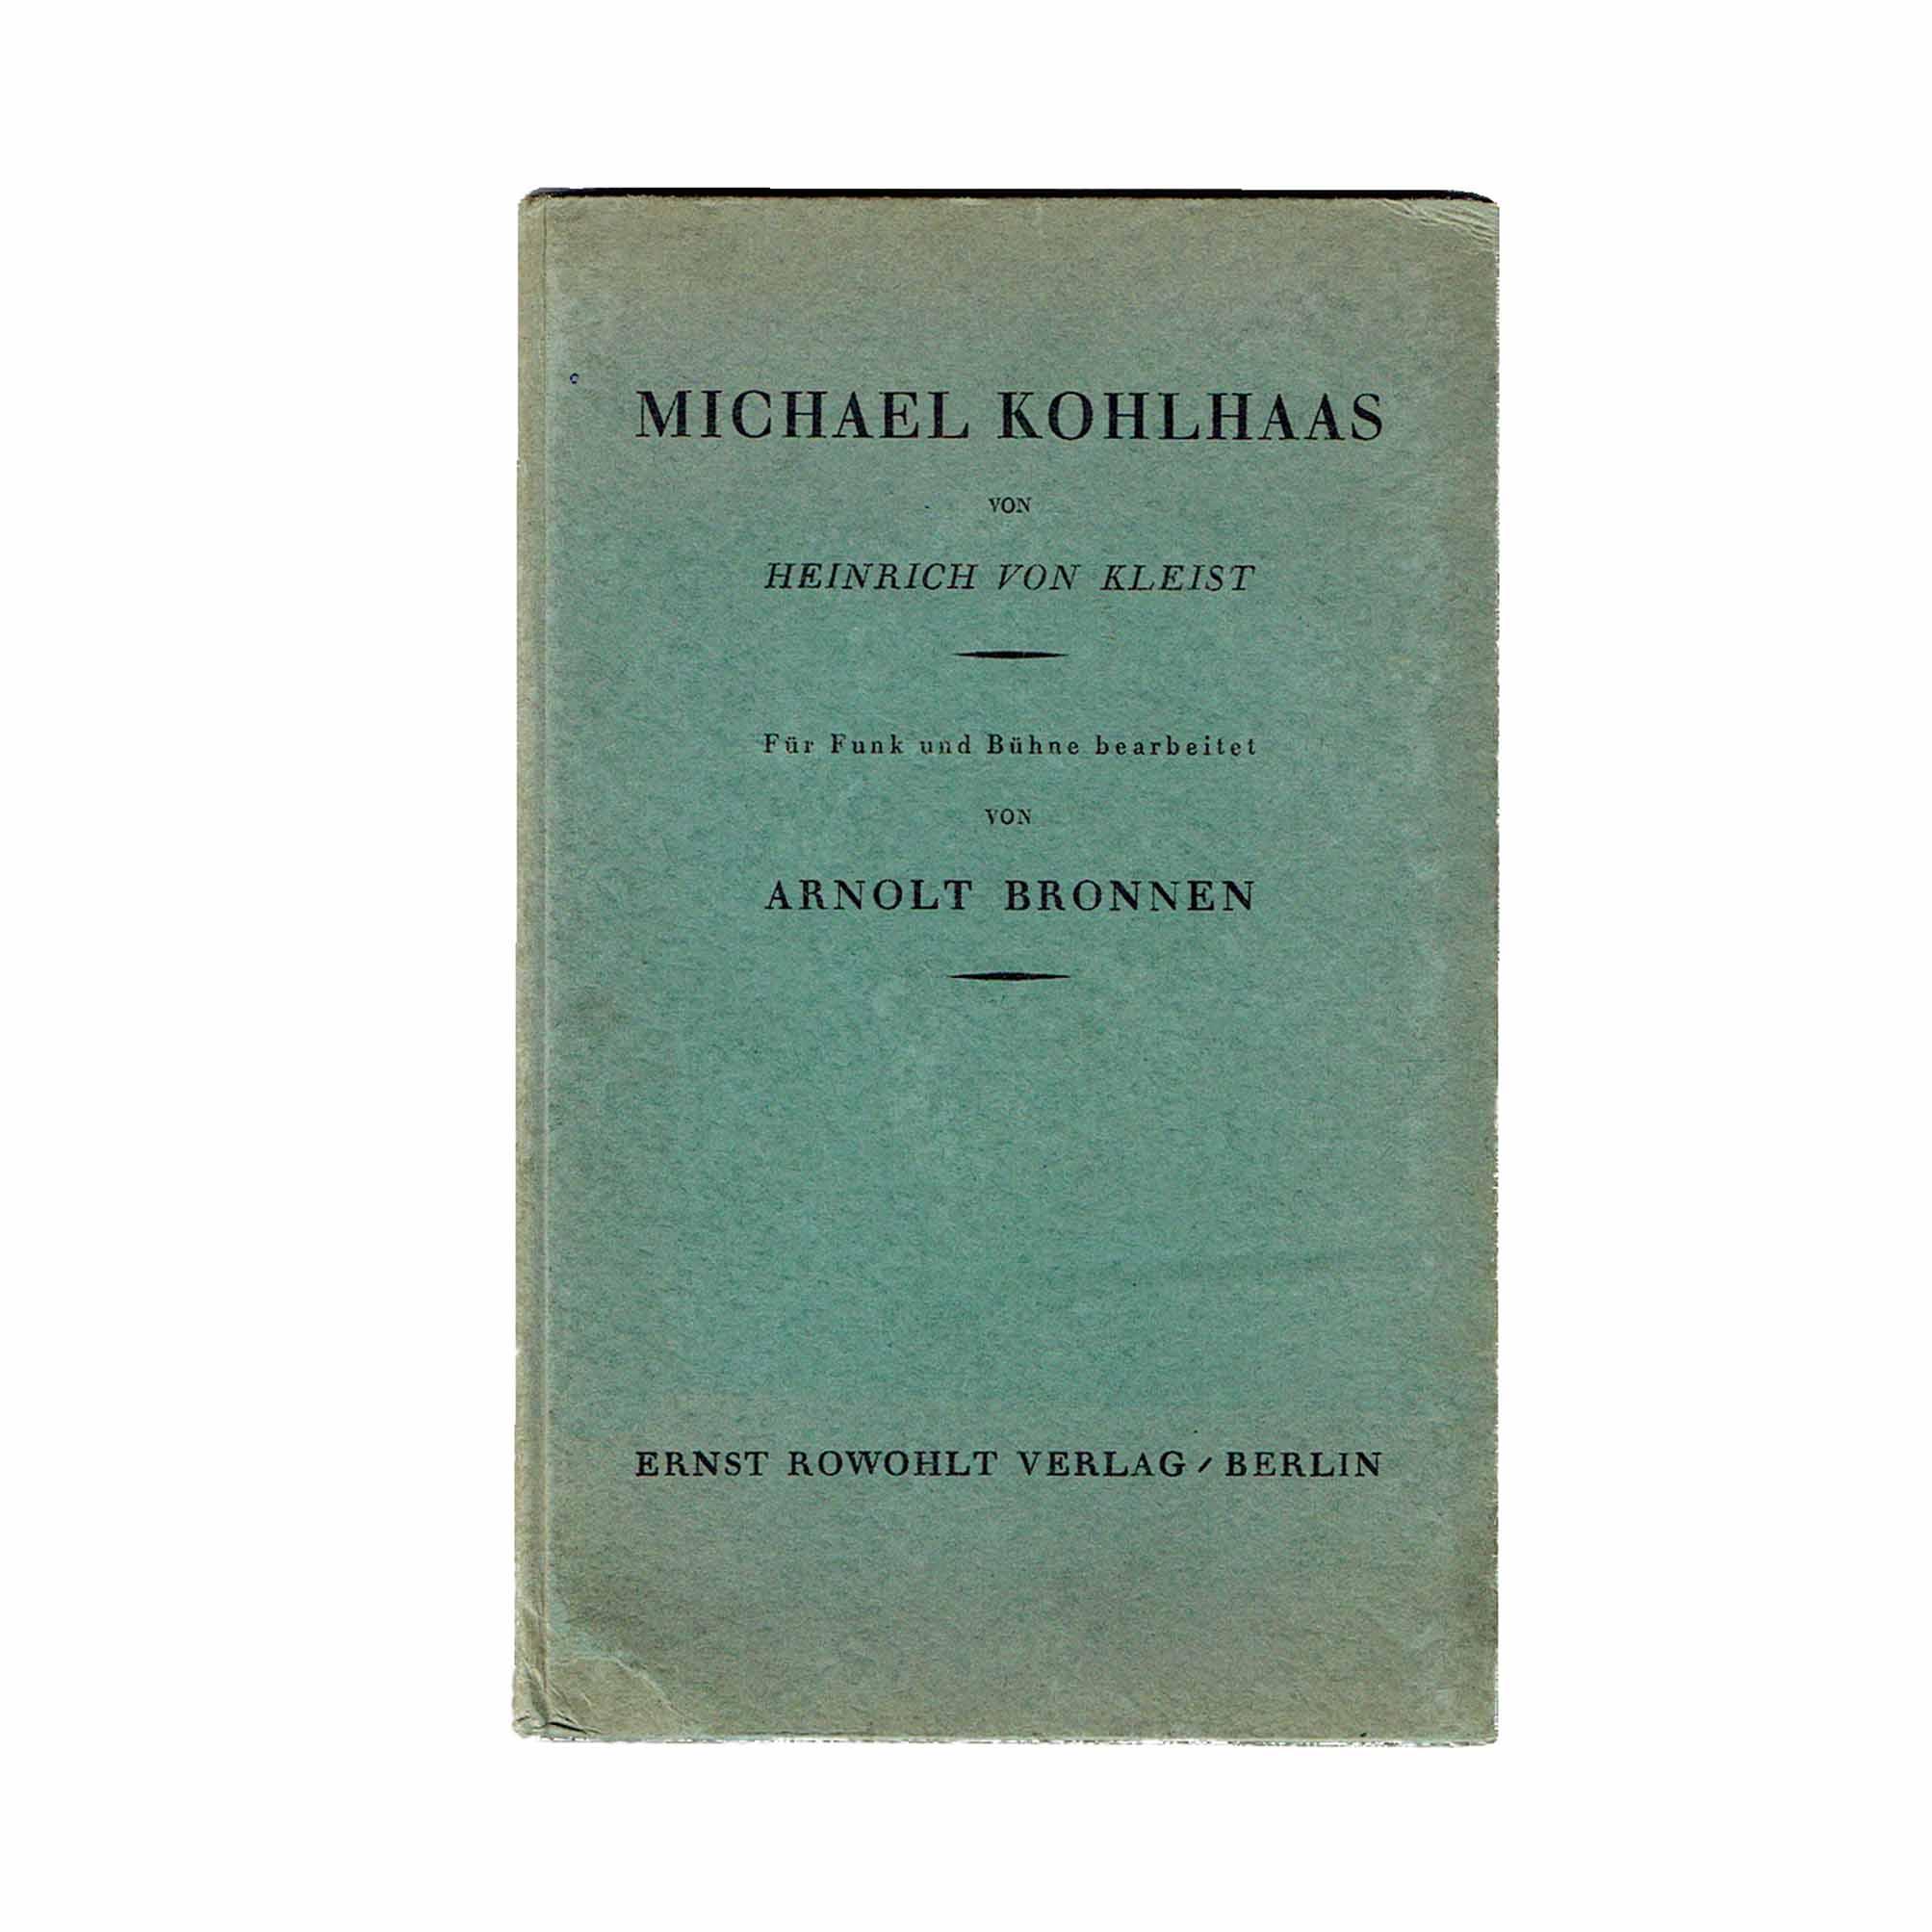 5508-Bronnen-Kleist-Kohlhaas-1929-Einband-frei-N.jpeg